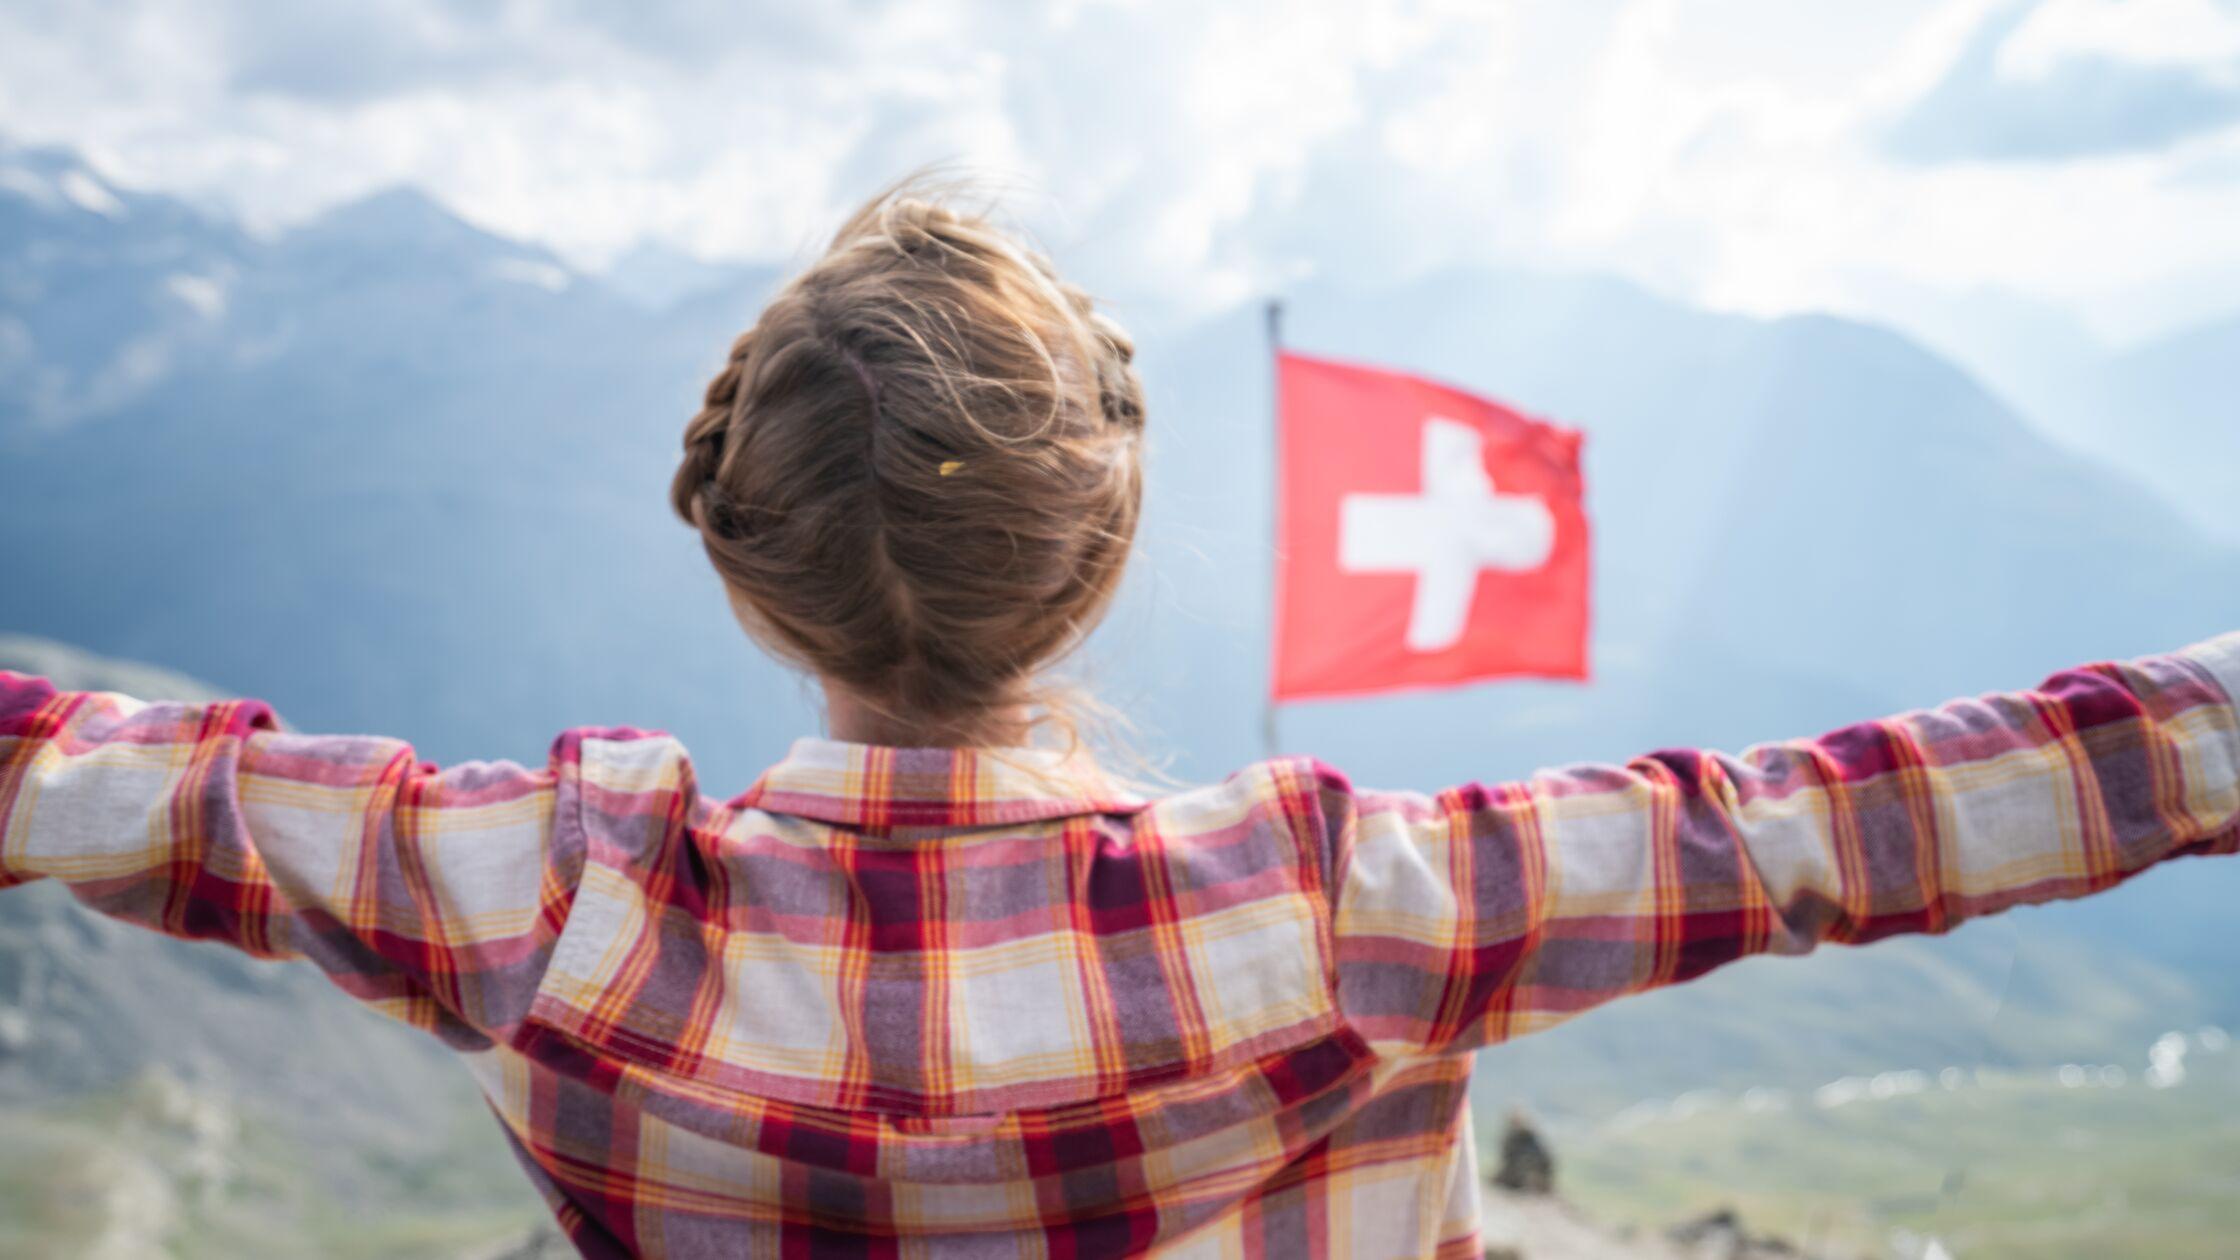 Frau am Matterhorn mit Schweizer Flagge